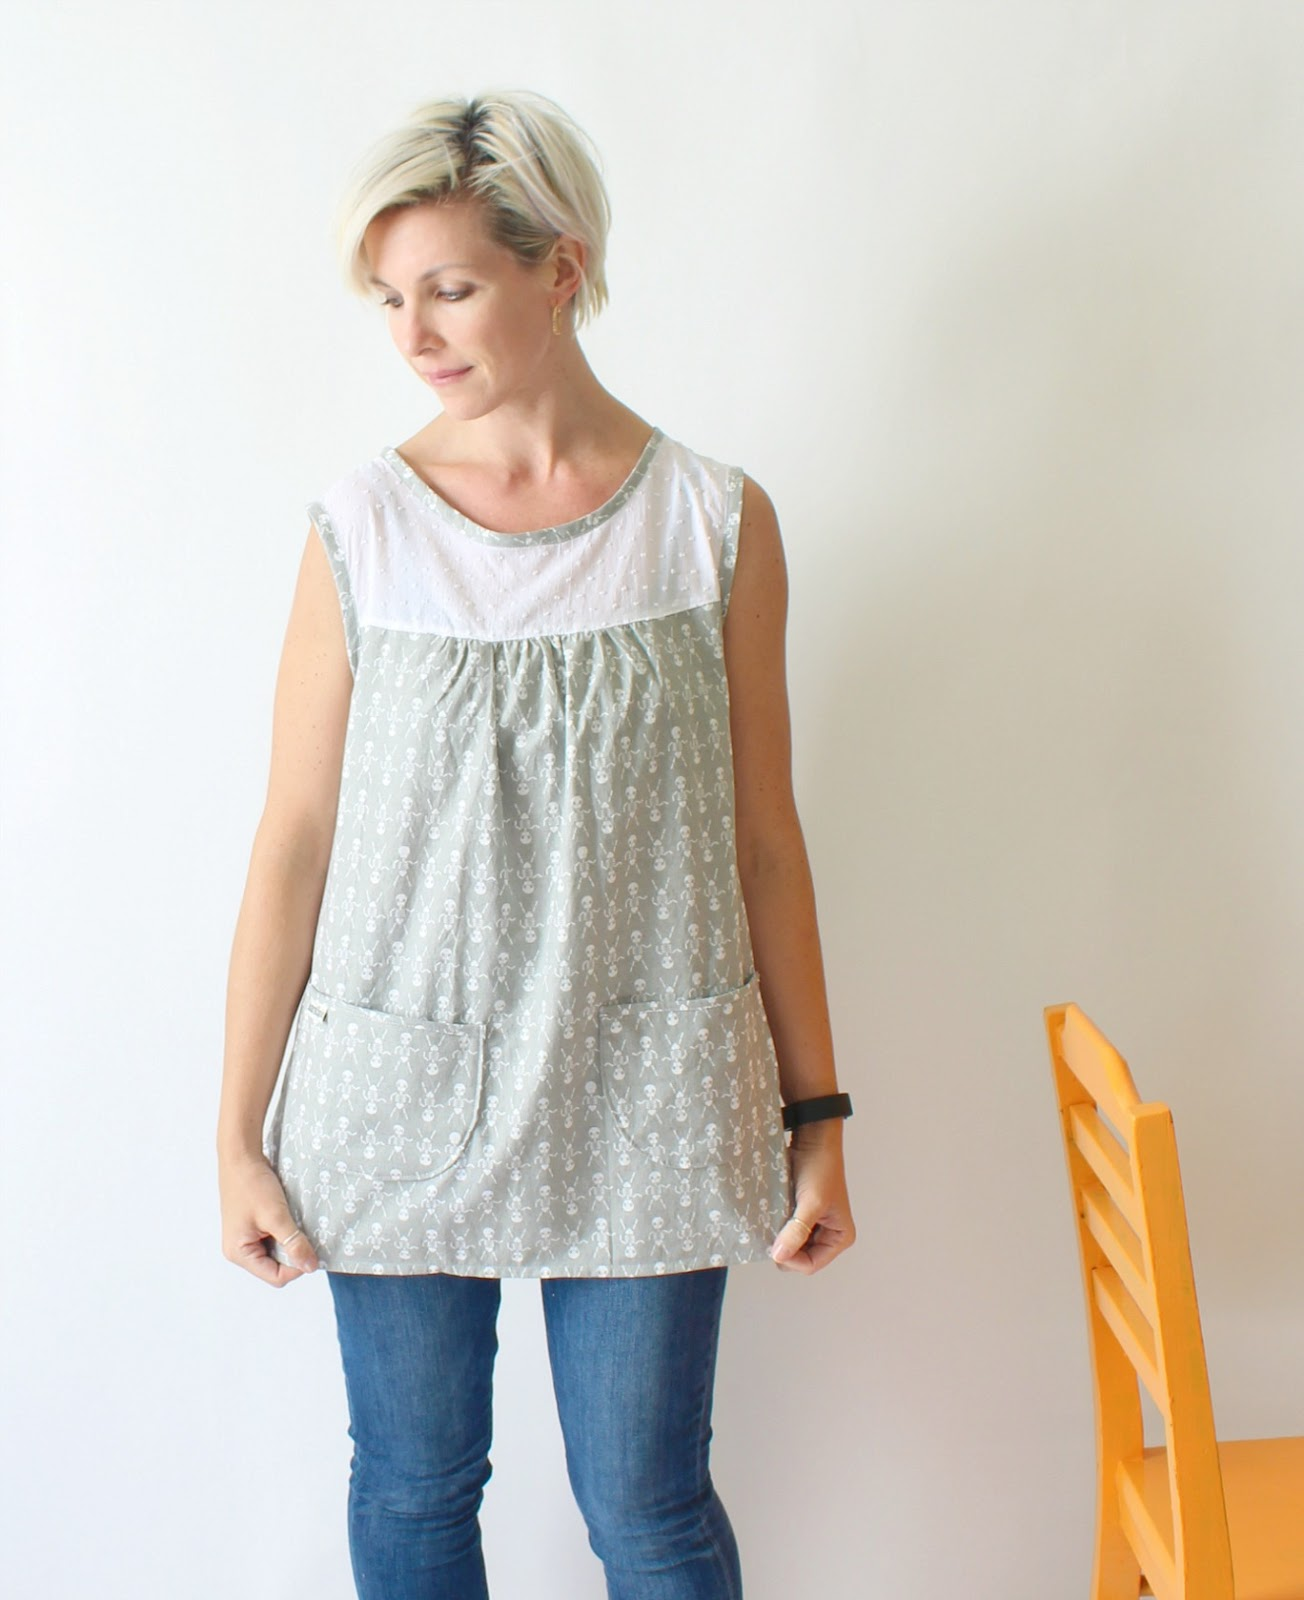 sewhungryhippie: Favorite Sewing Patterns